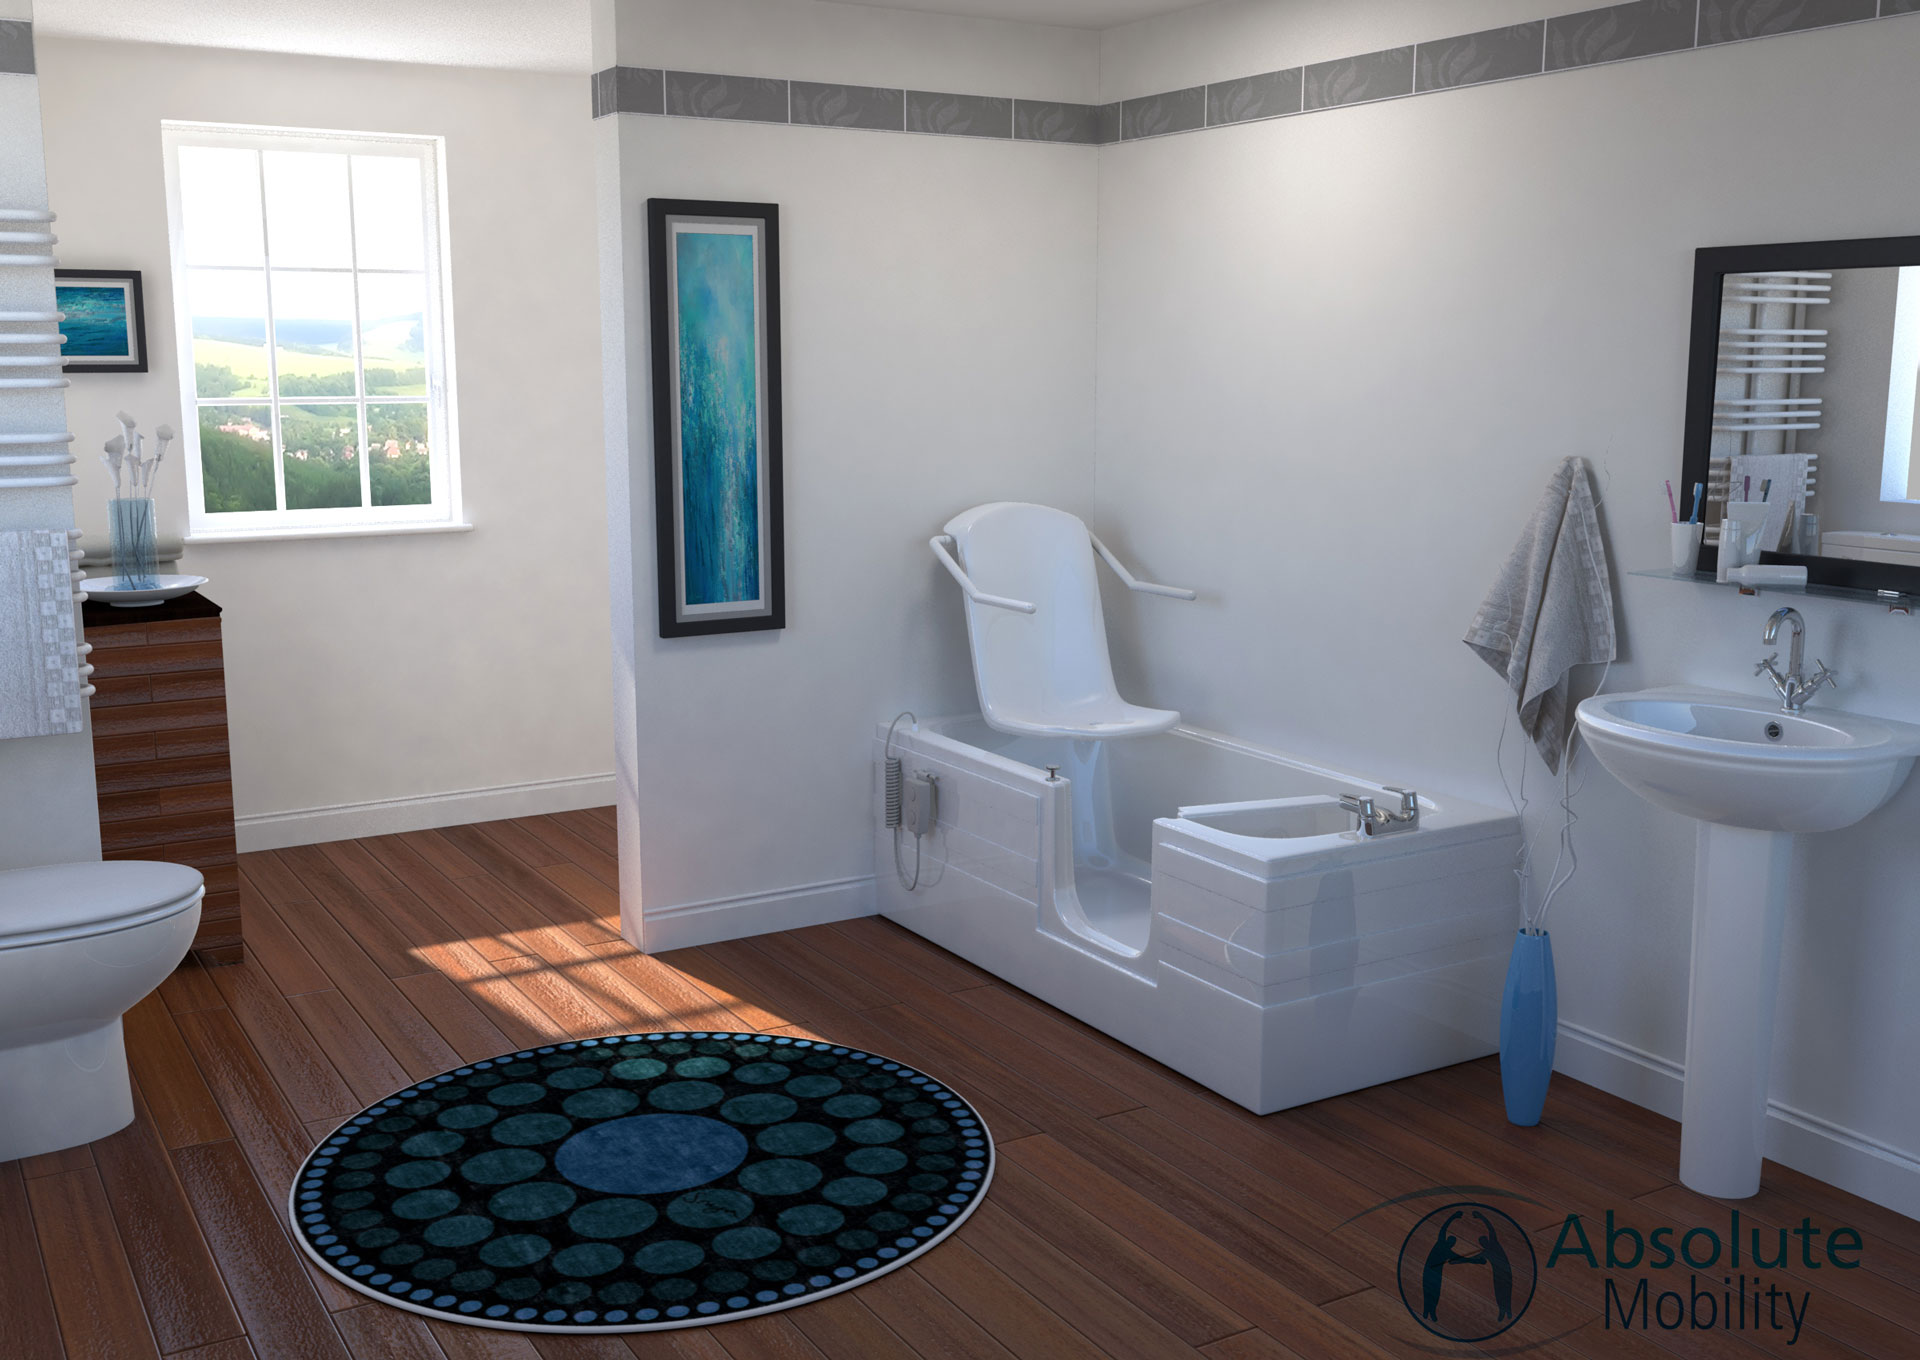 bathroom VR image